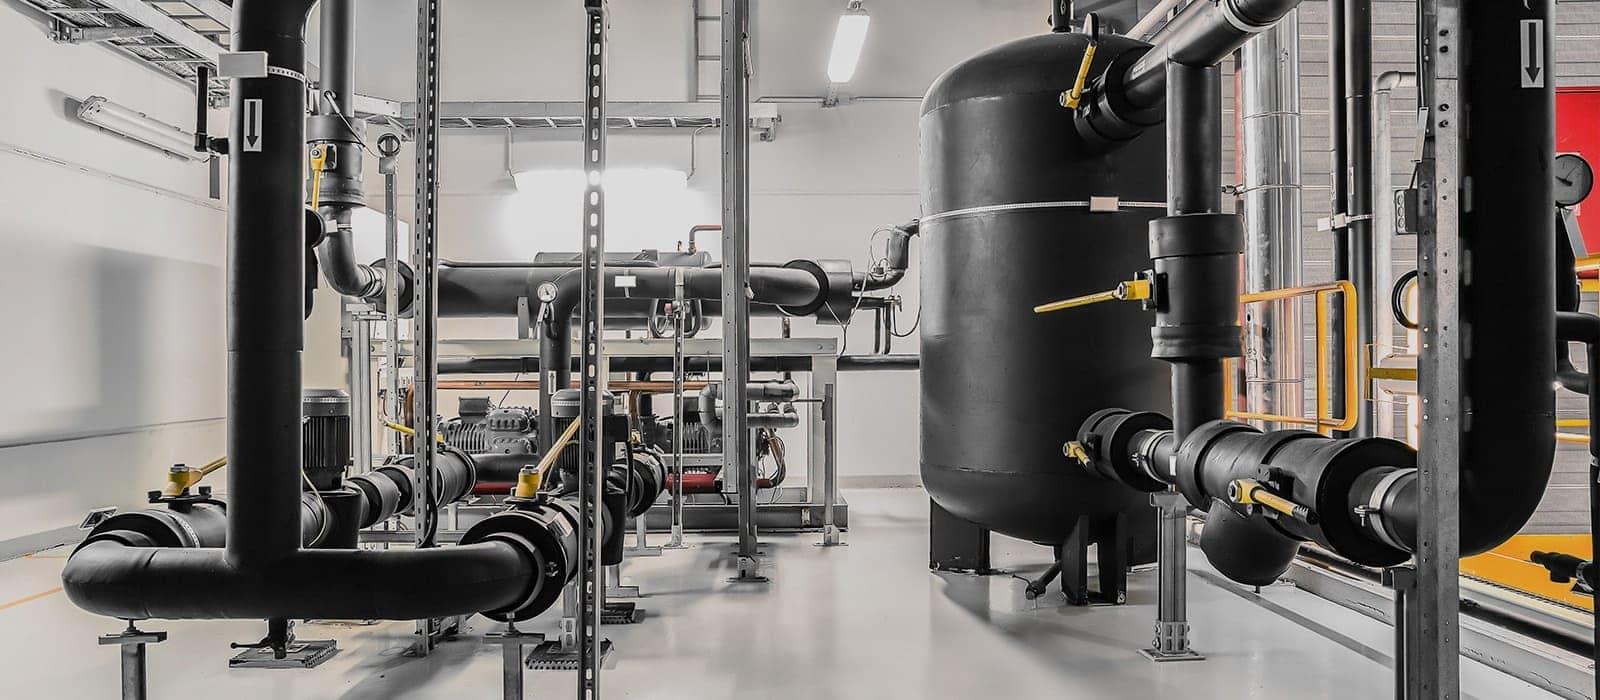 Air Dynamics | Commercial Boiler Chiller